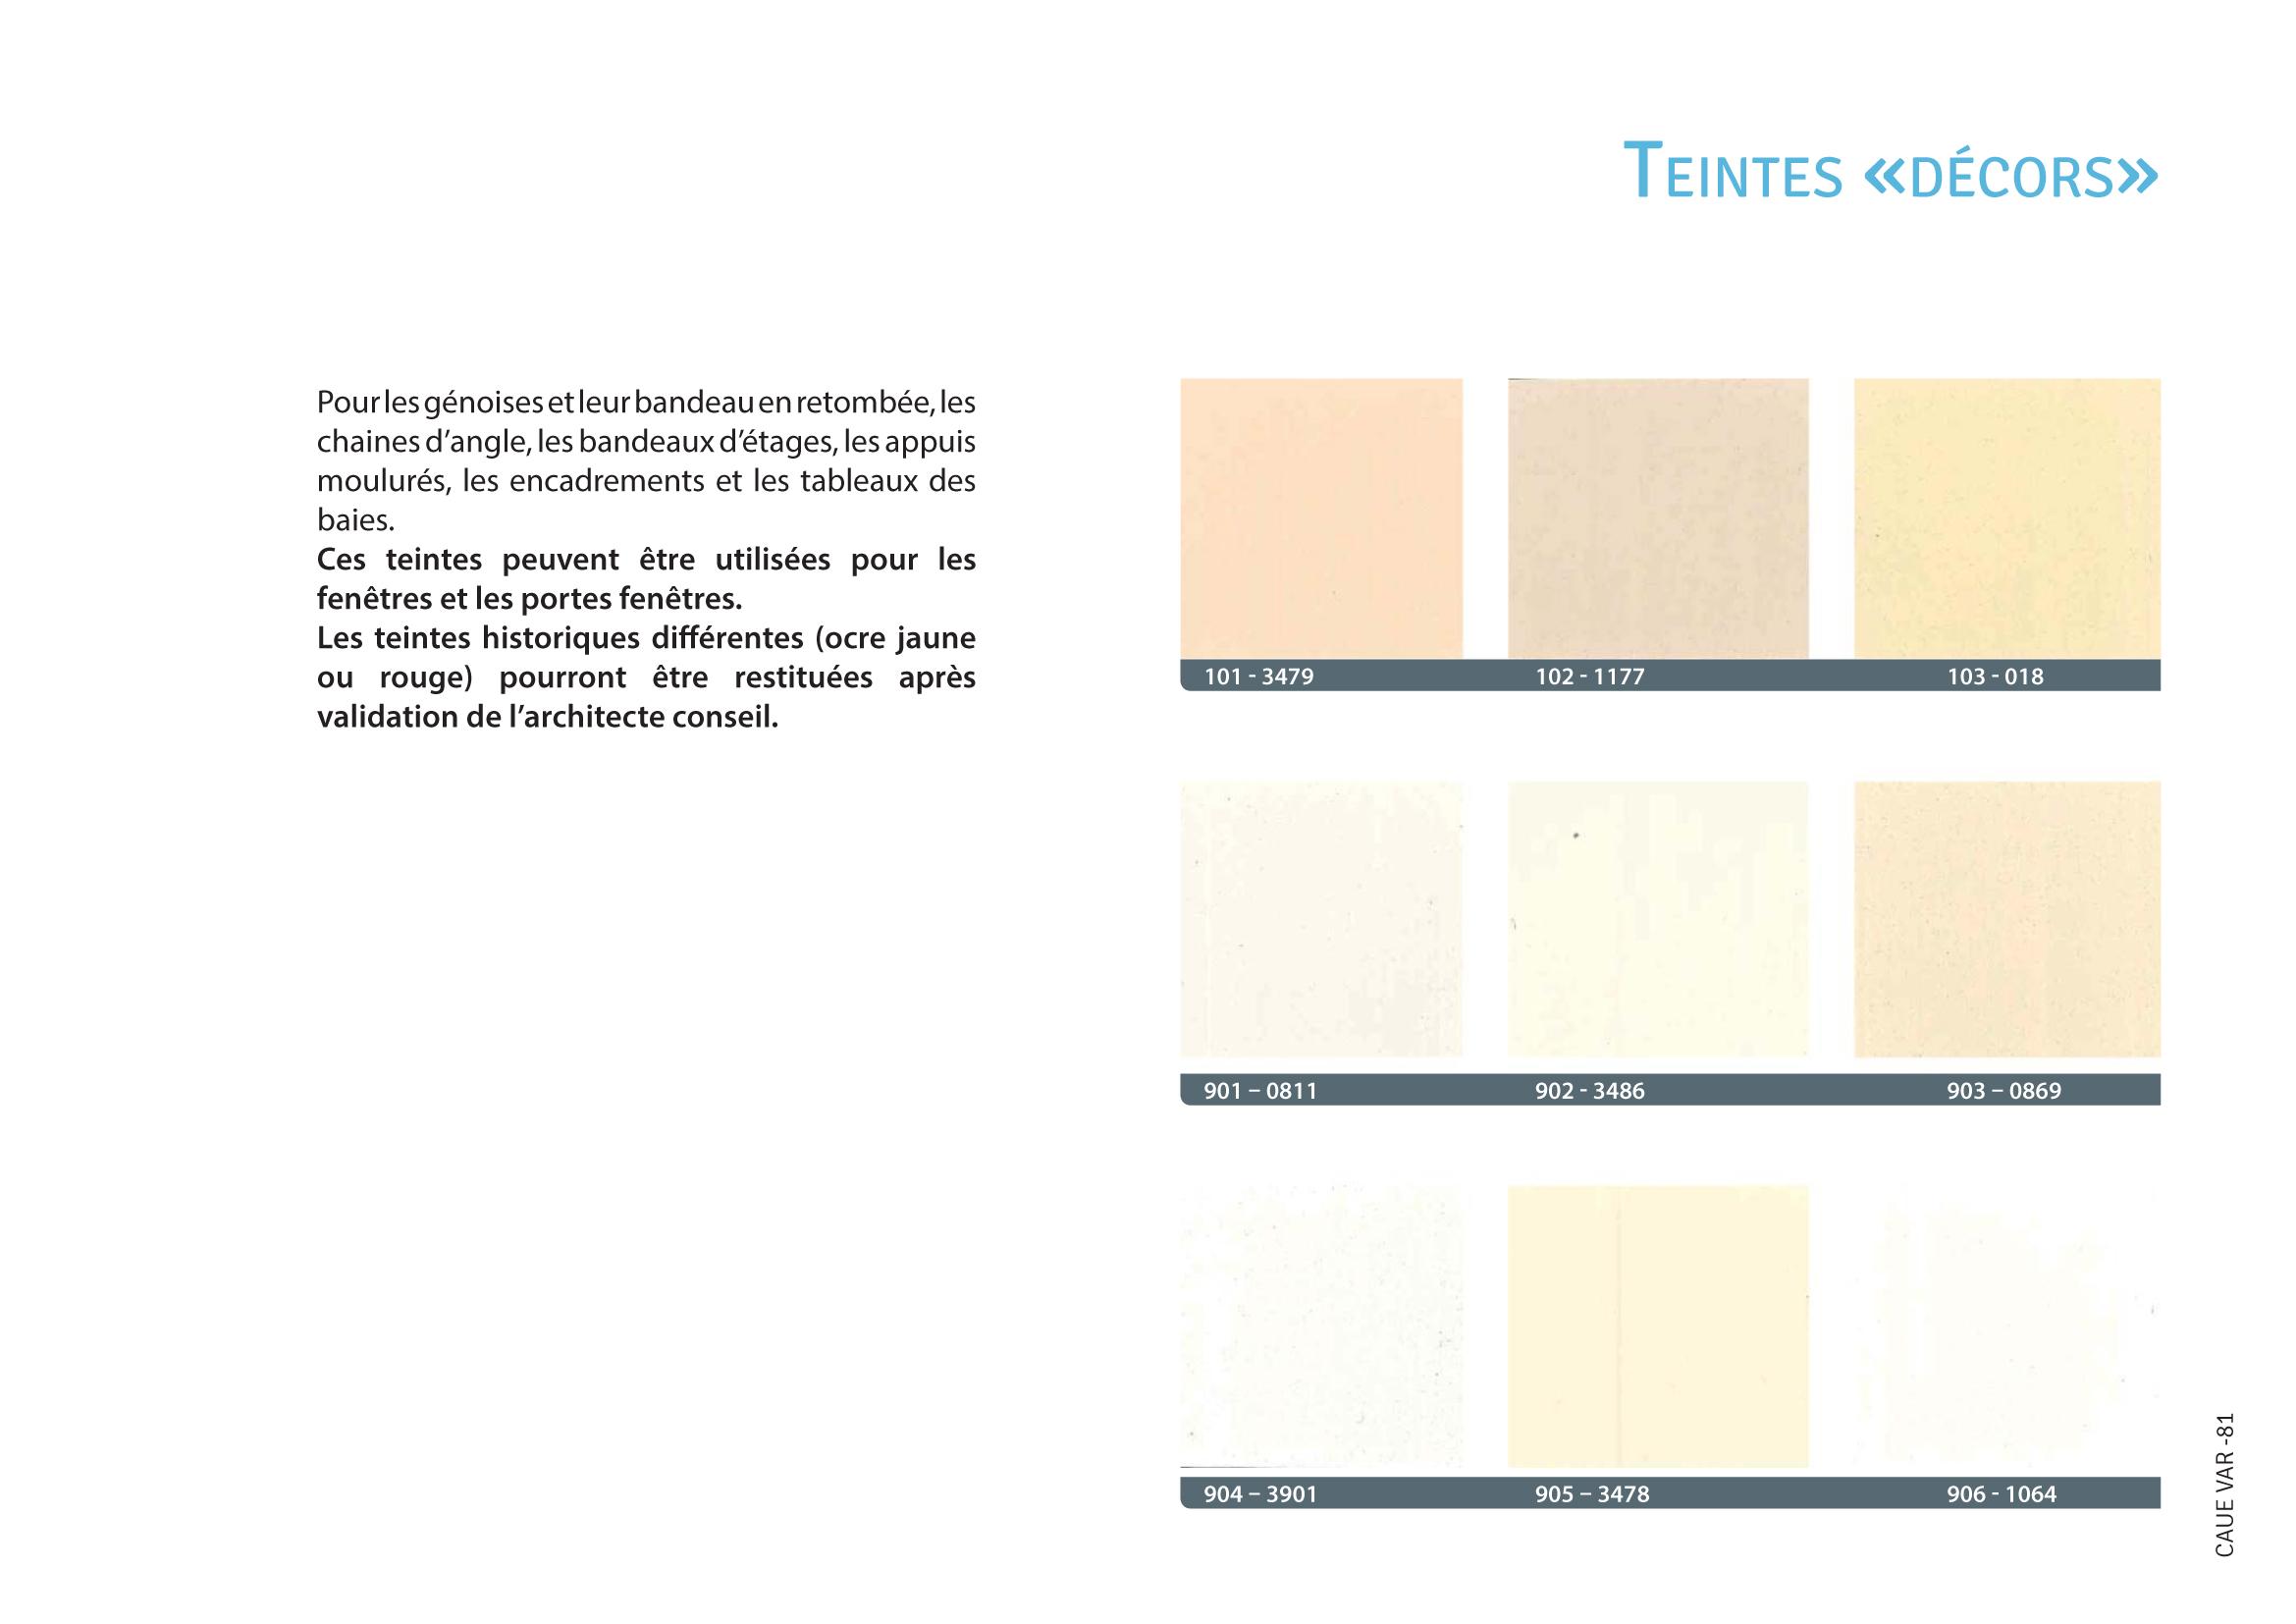 07_teintes_decors-jpg